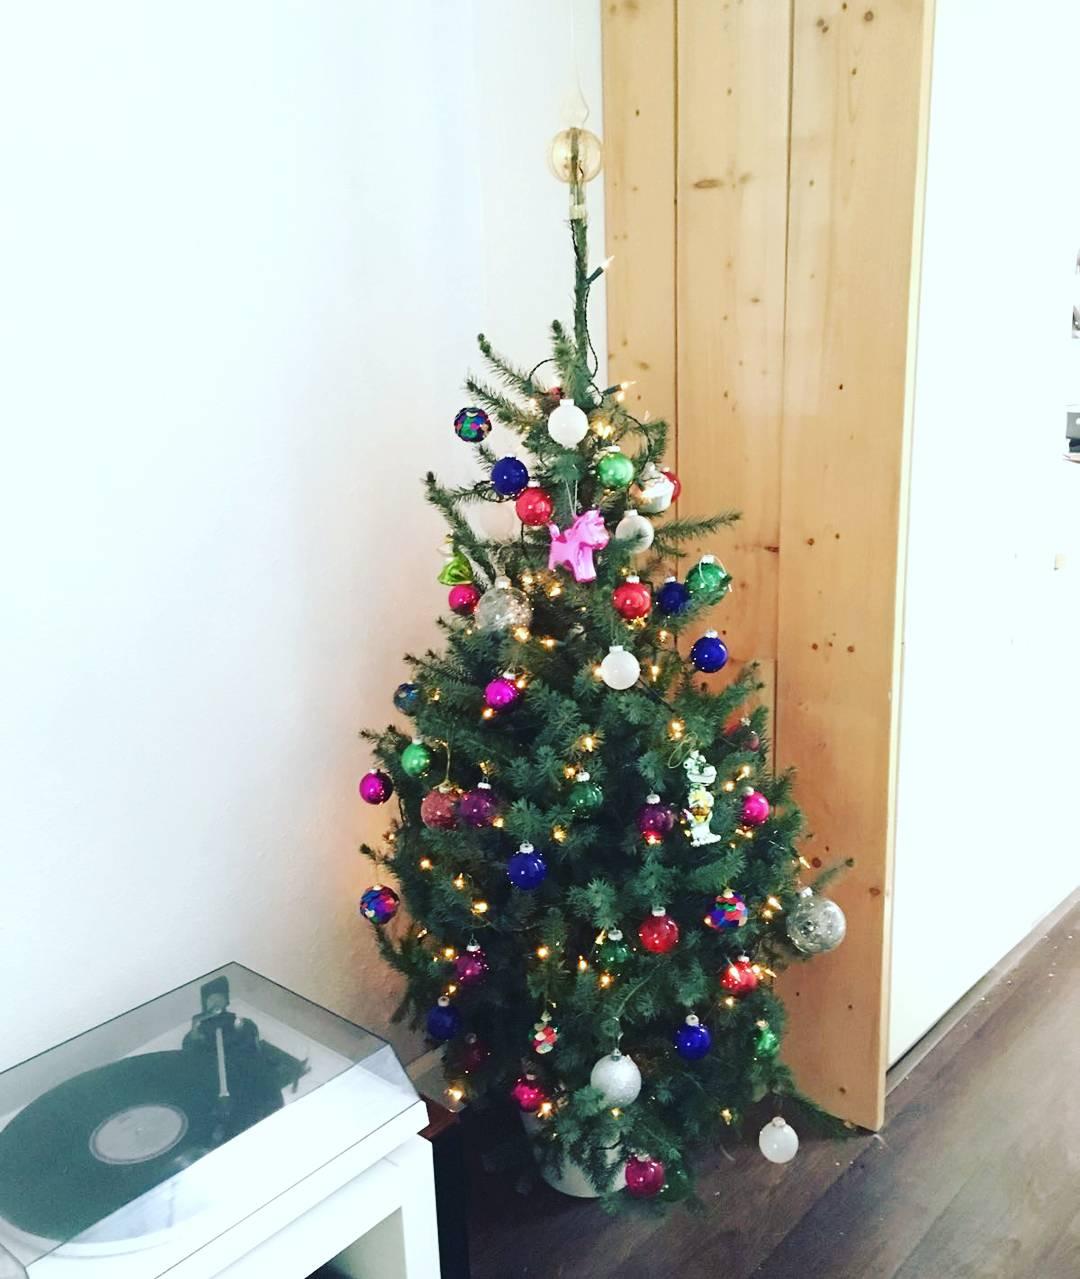 december kerstboom delft